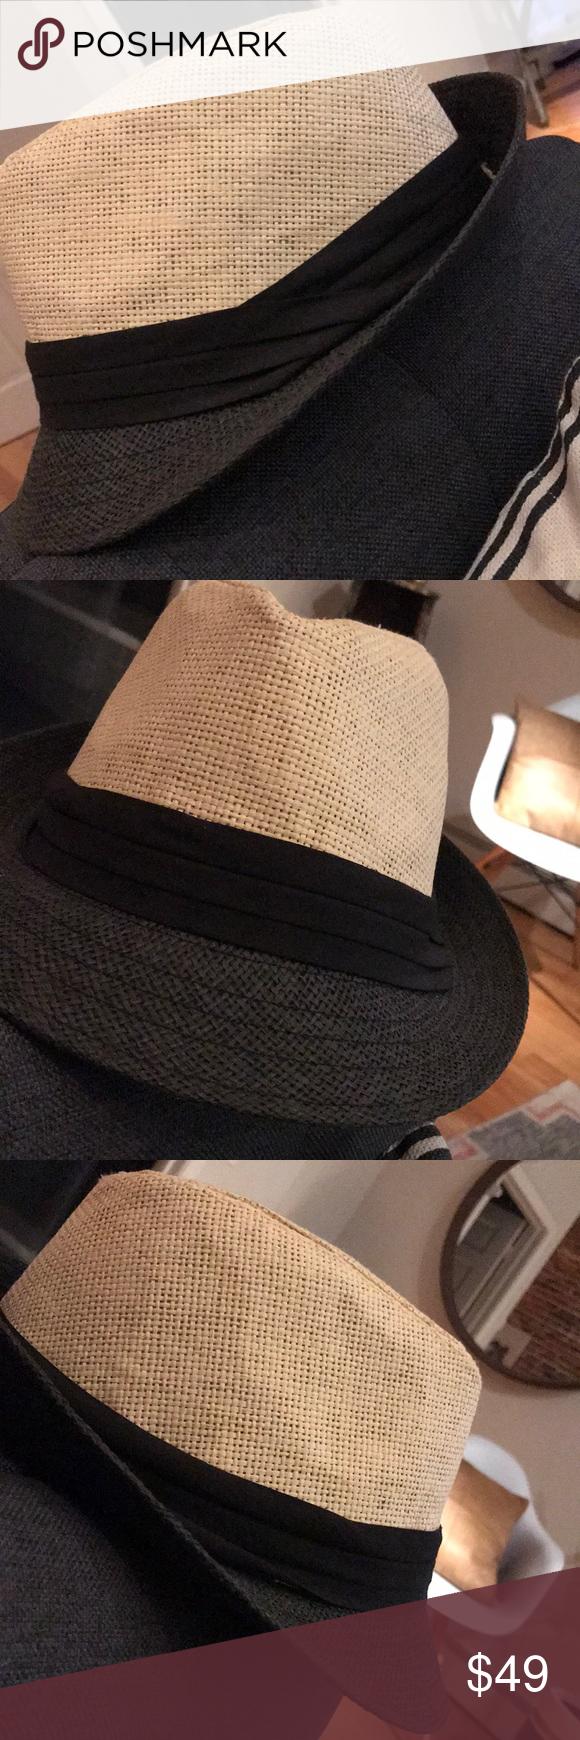 fc6ee5851376a Black and Tan Fedora Black and Tan Fedora w black band around brim  Accessories Hats